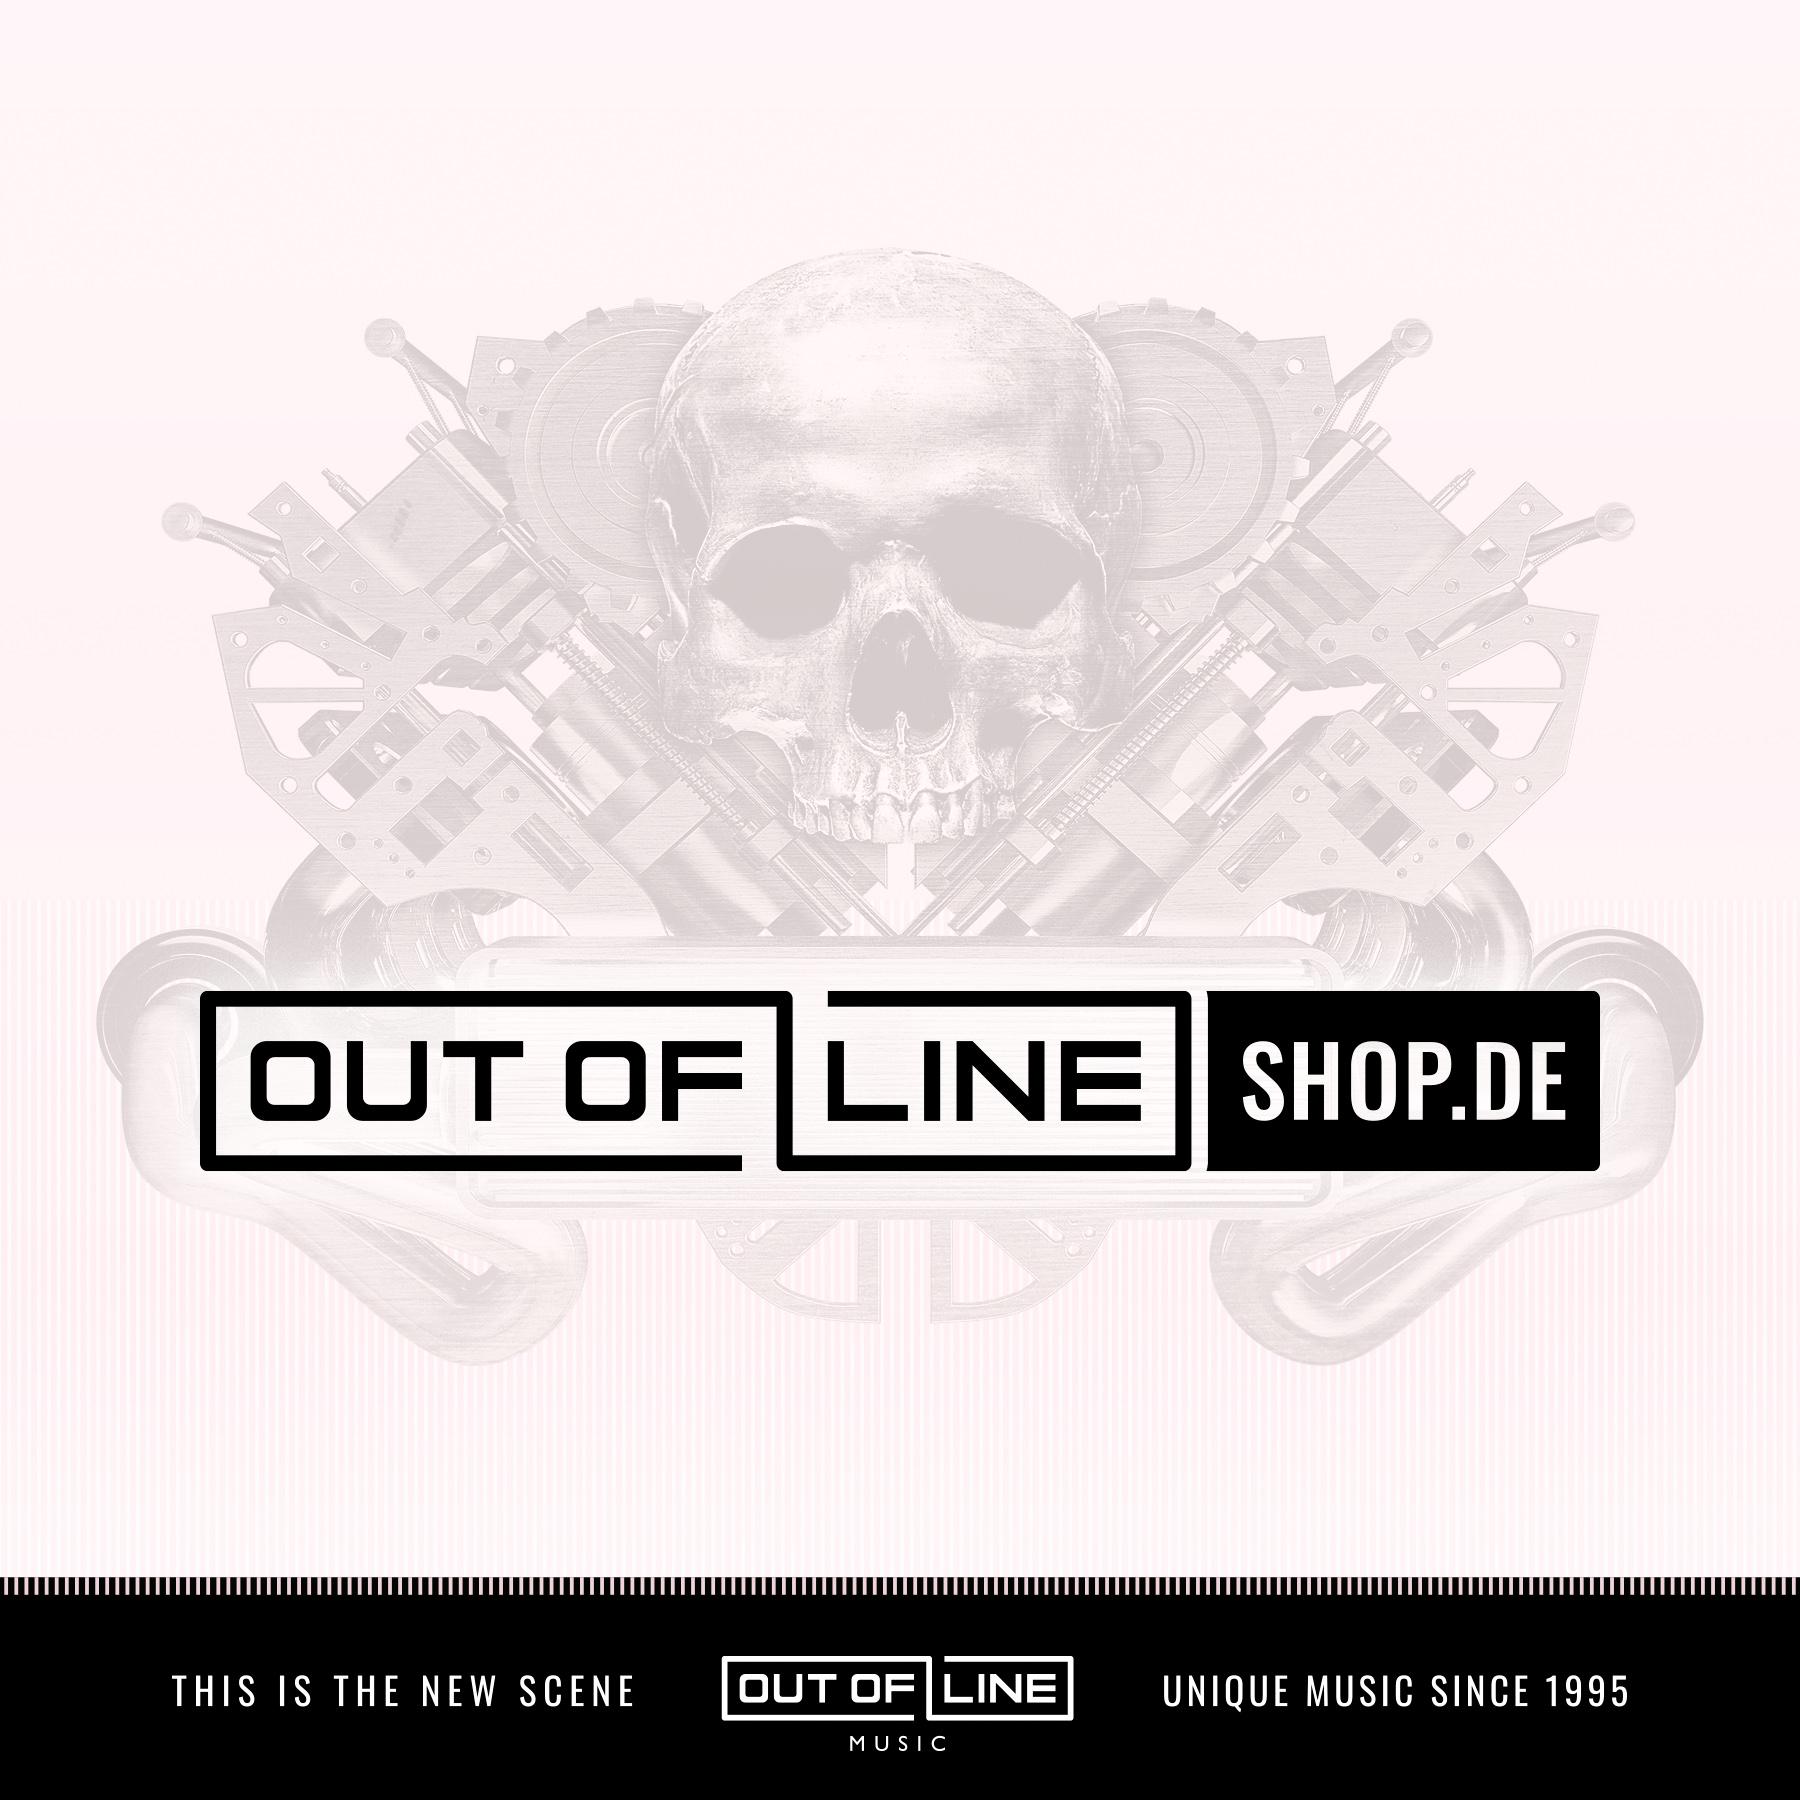 V.A. - Mark Reeder: Five Point One - CD/DVD - 2CD+DVD